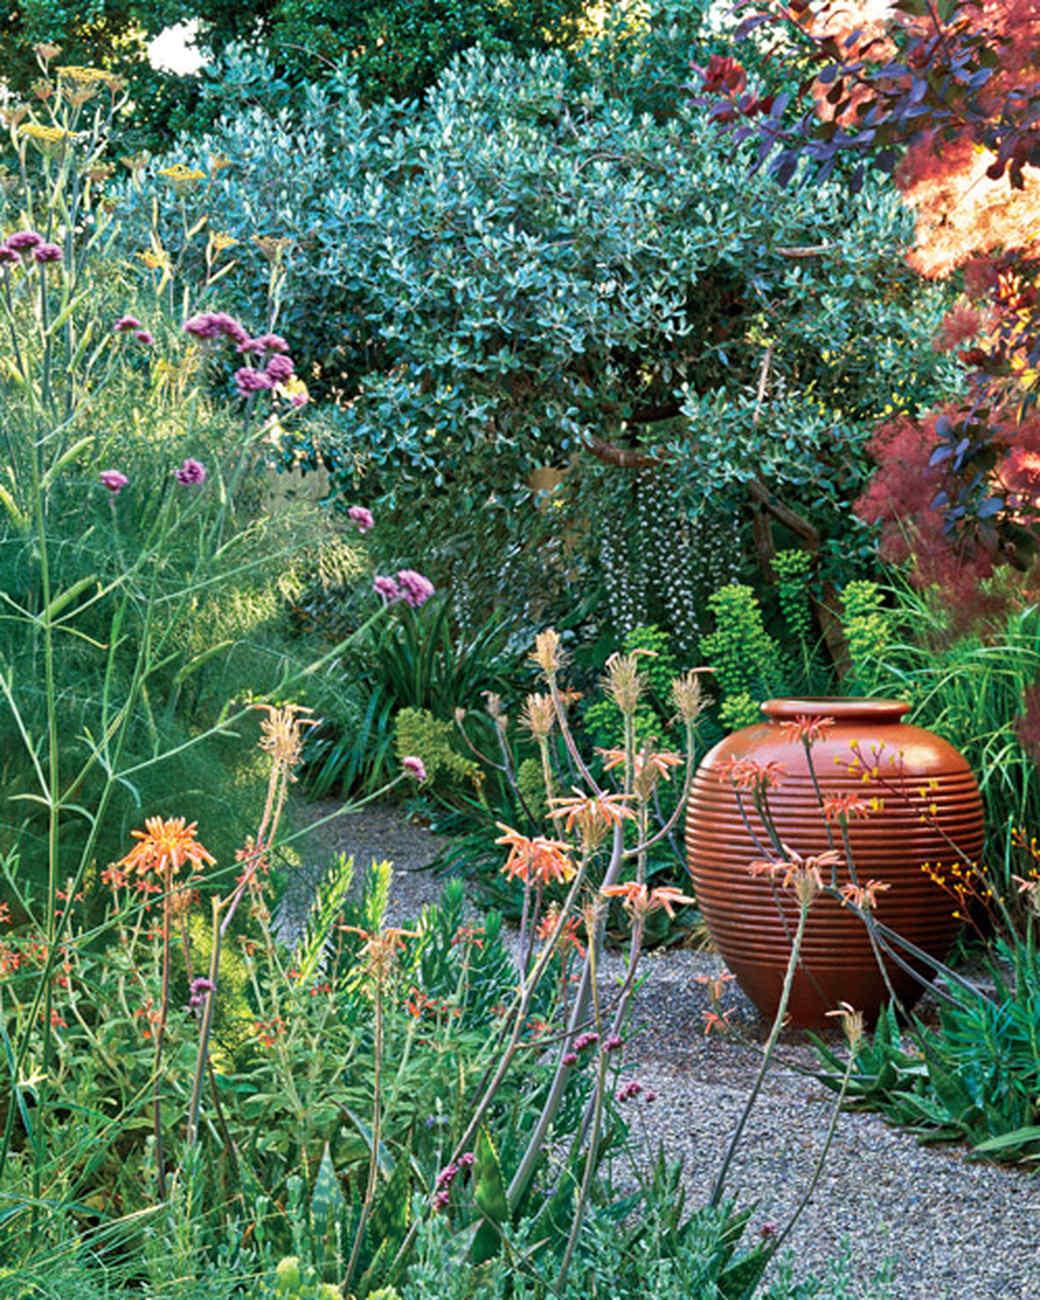 mla10490_0809_vought_garden6.jpg